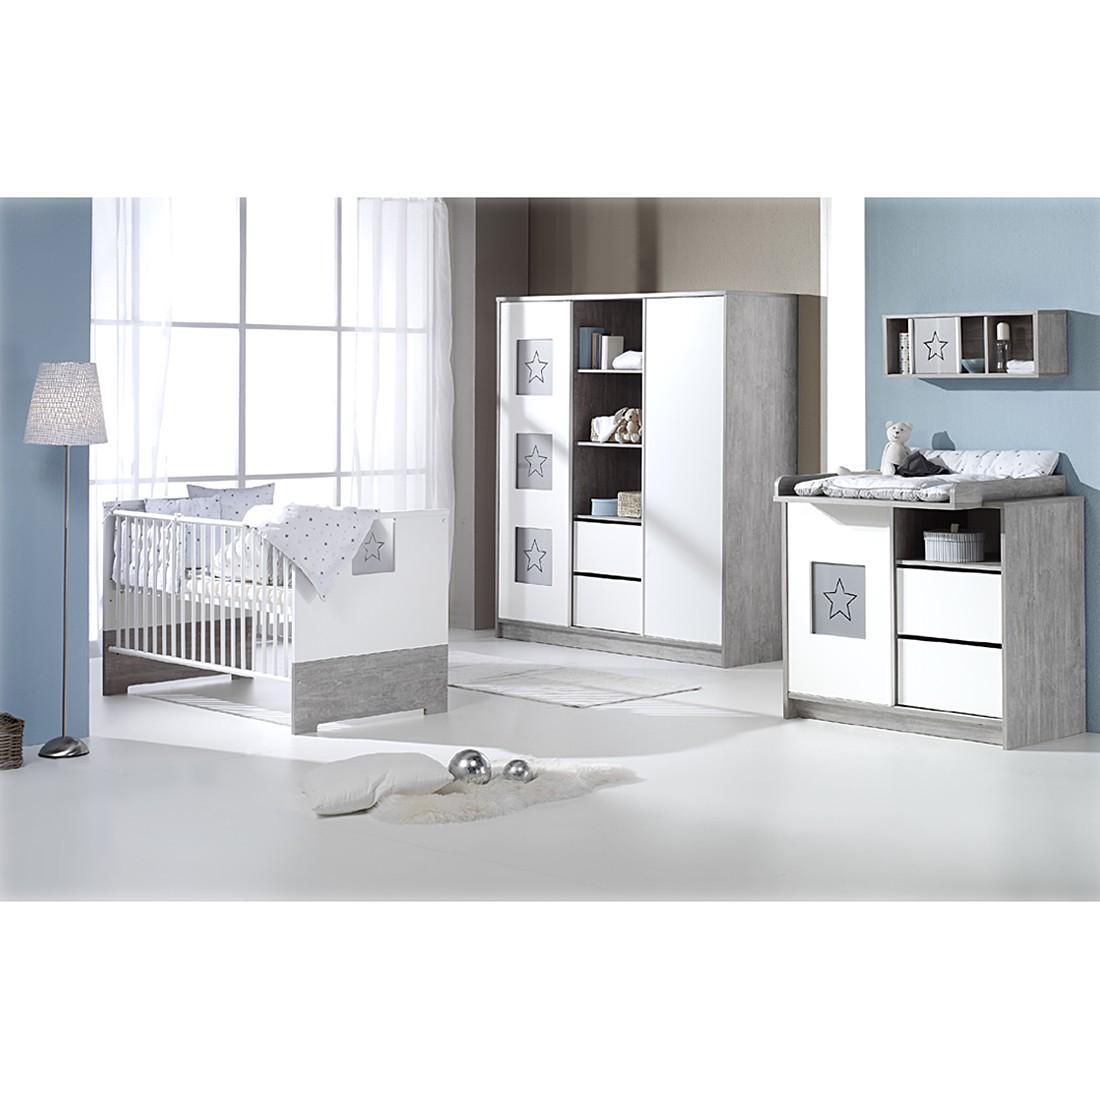 home24 Babyzimmer Eco Star (3-tlg.) | Kinderzimmer > Babymöbel | Grau | Holzwerkstoff | Schardt